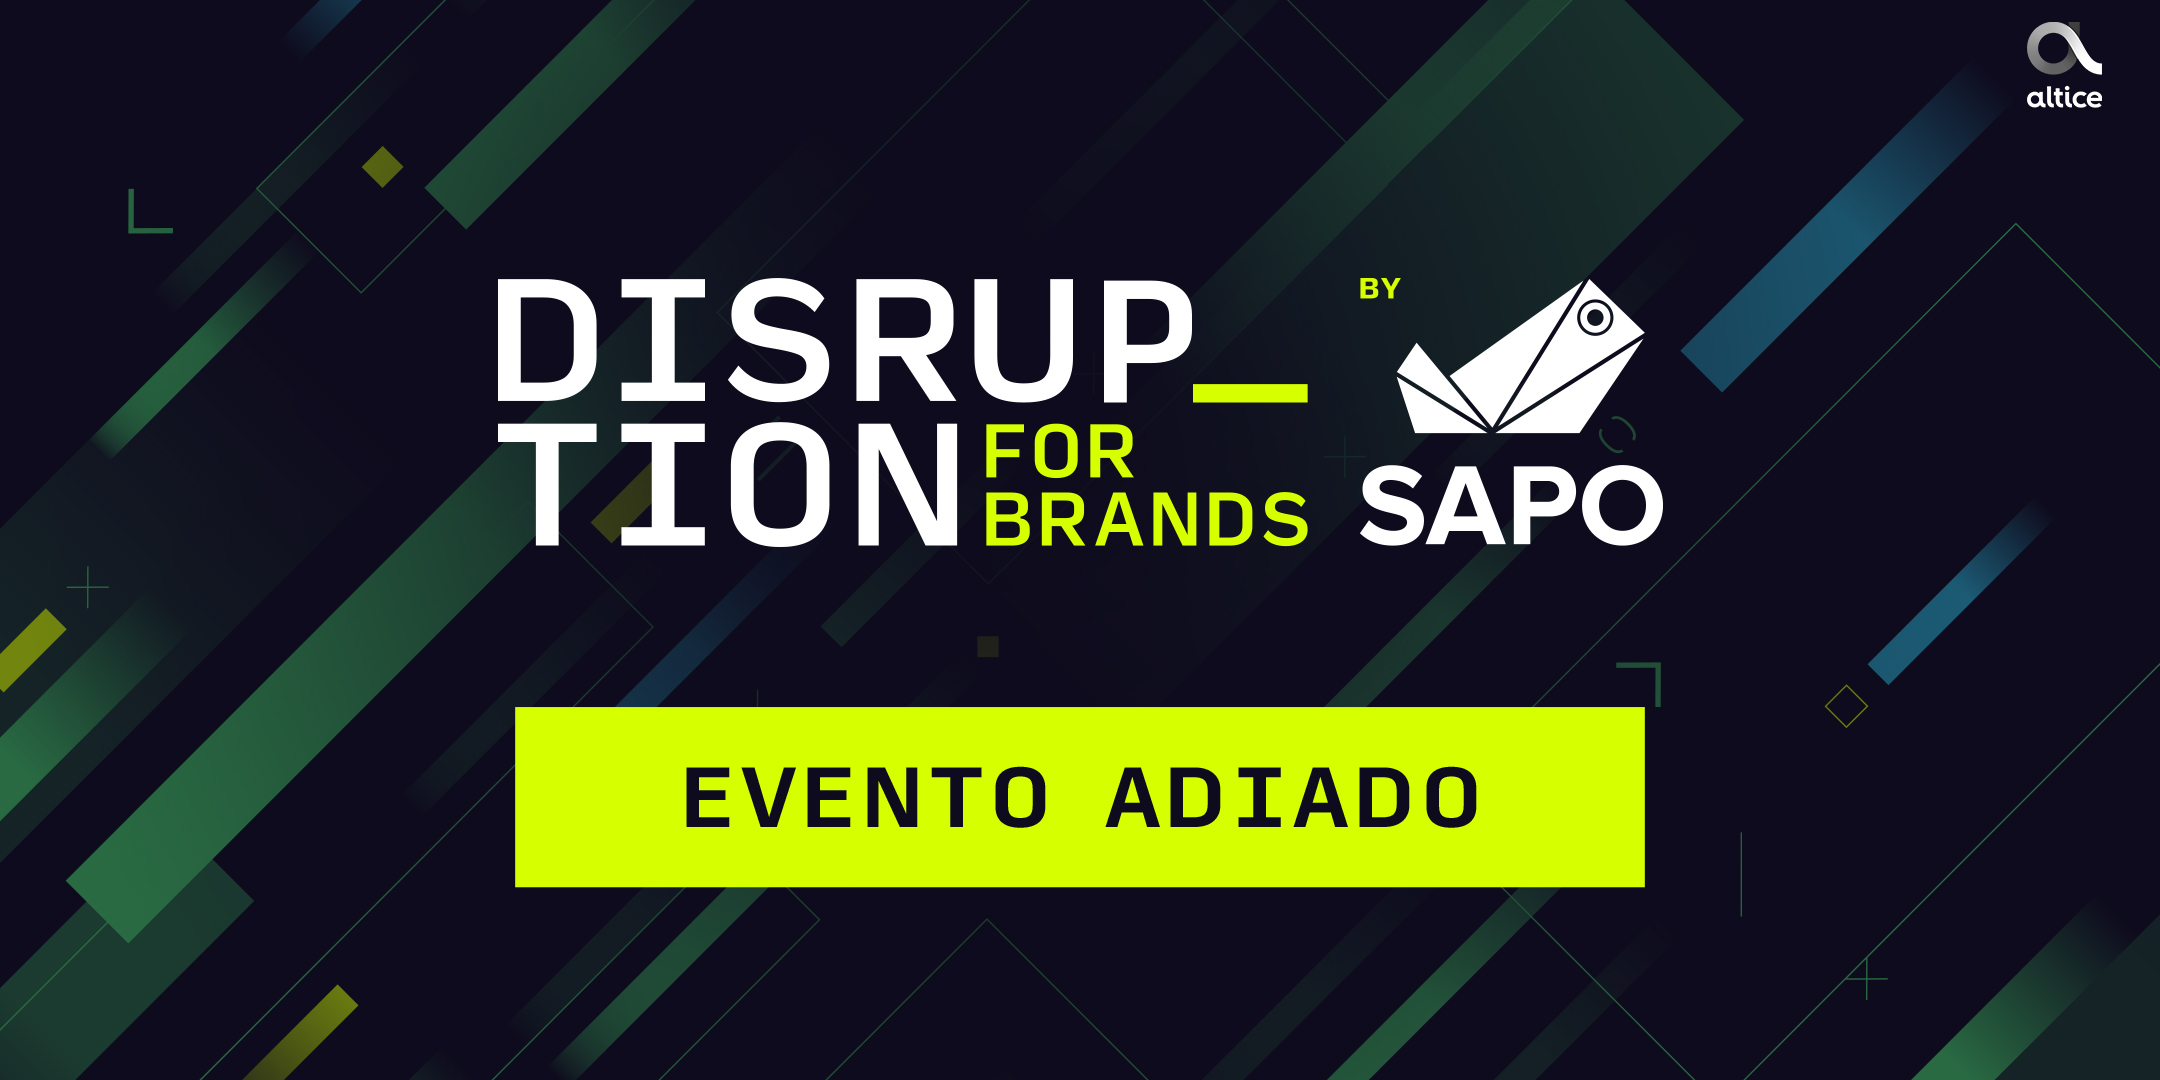 Habilite-se a ganhar bilhetes para a conferência  Disruption for Brands by SAPO